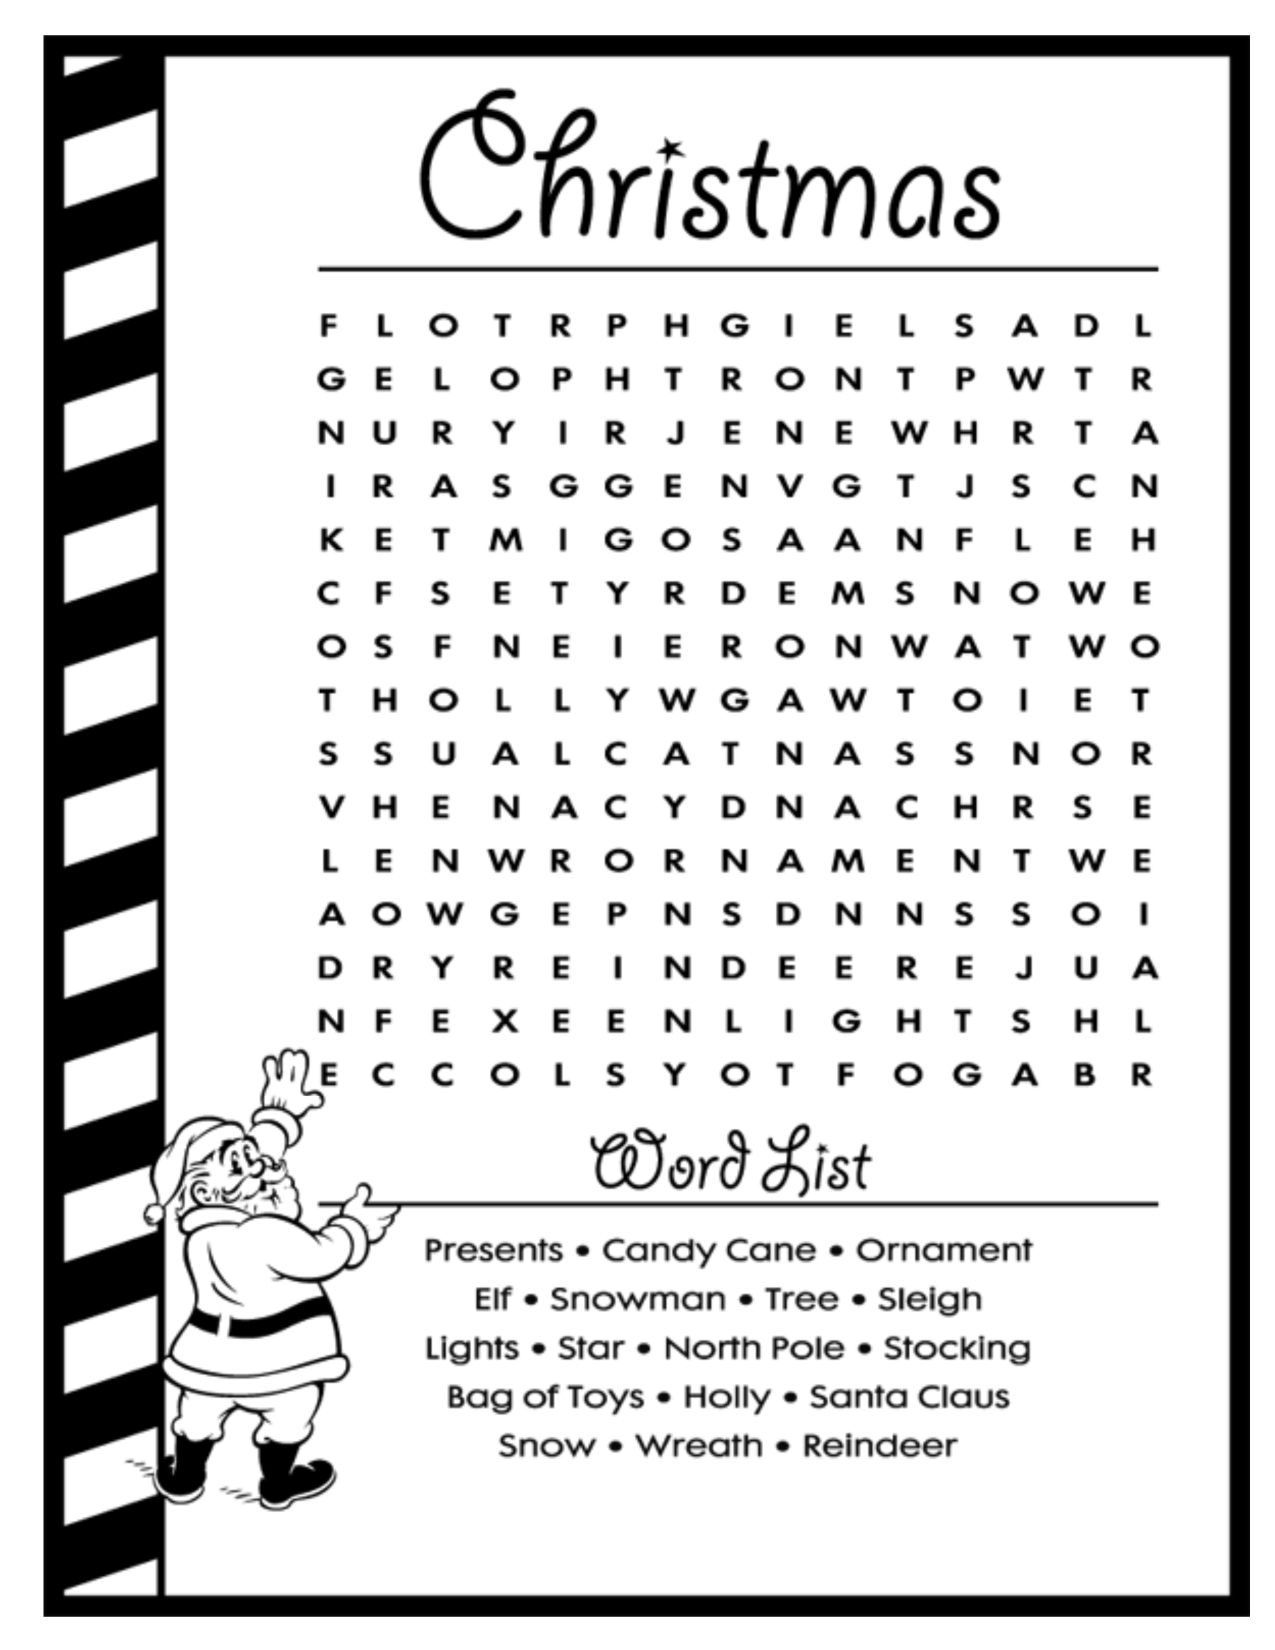 Christmaswordsearch1 1 275 1 650 Pixels